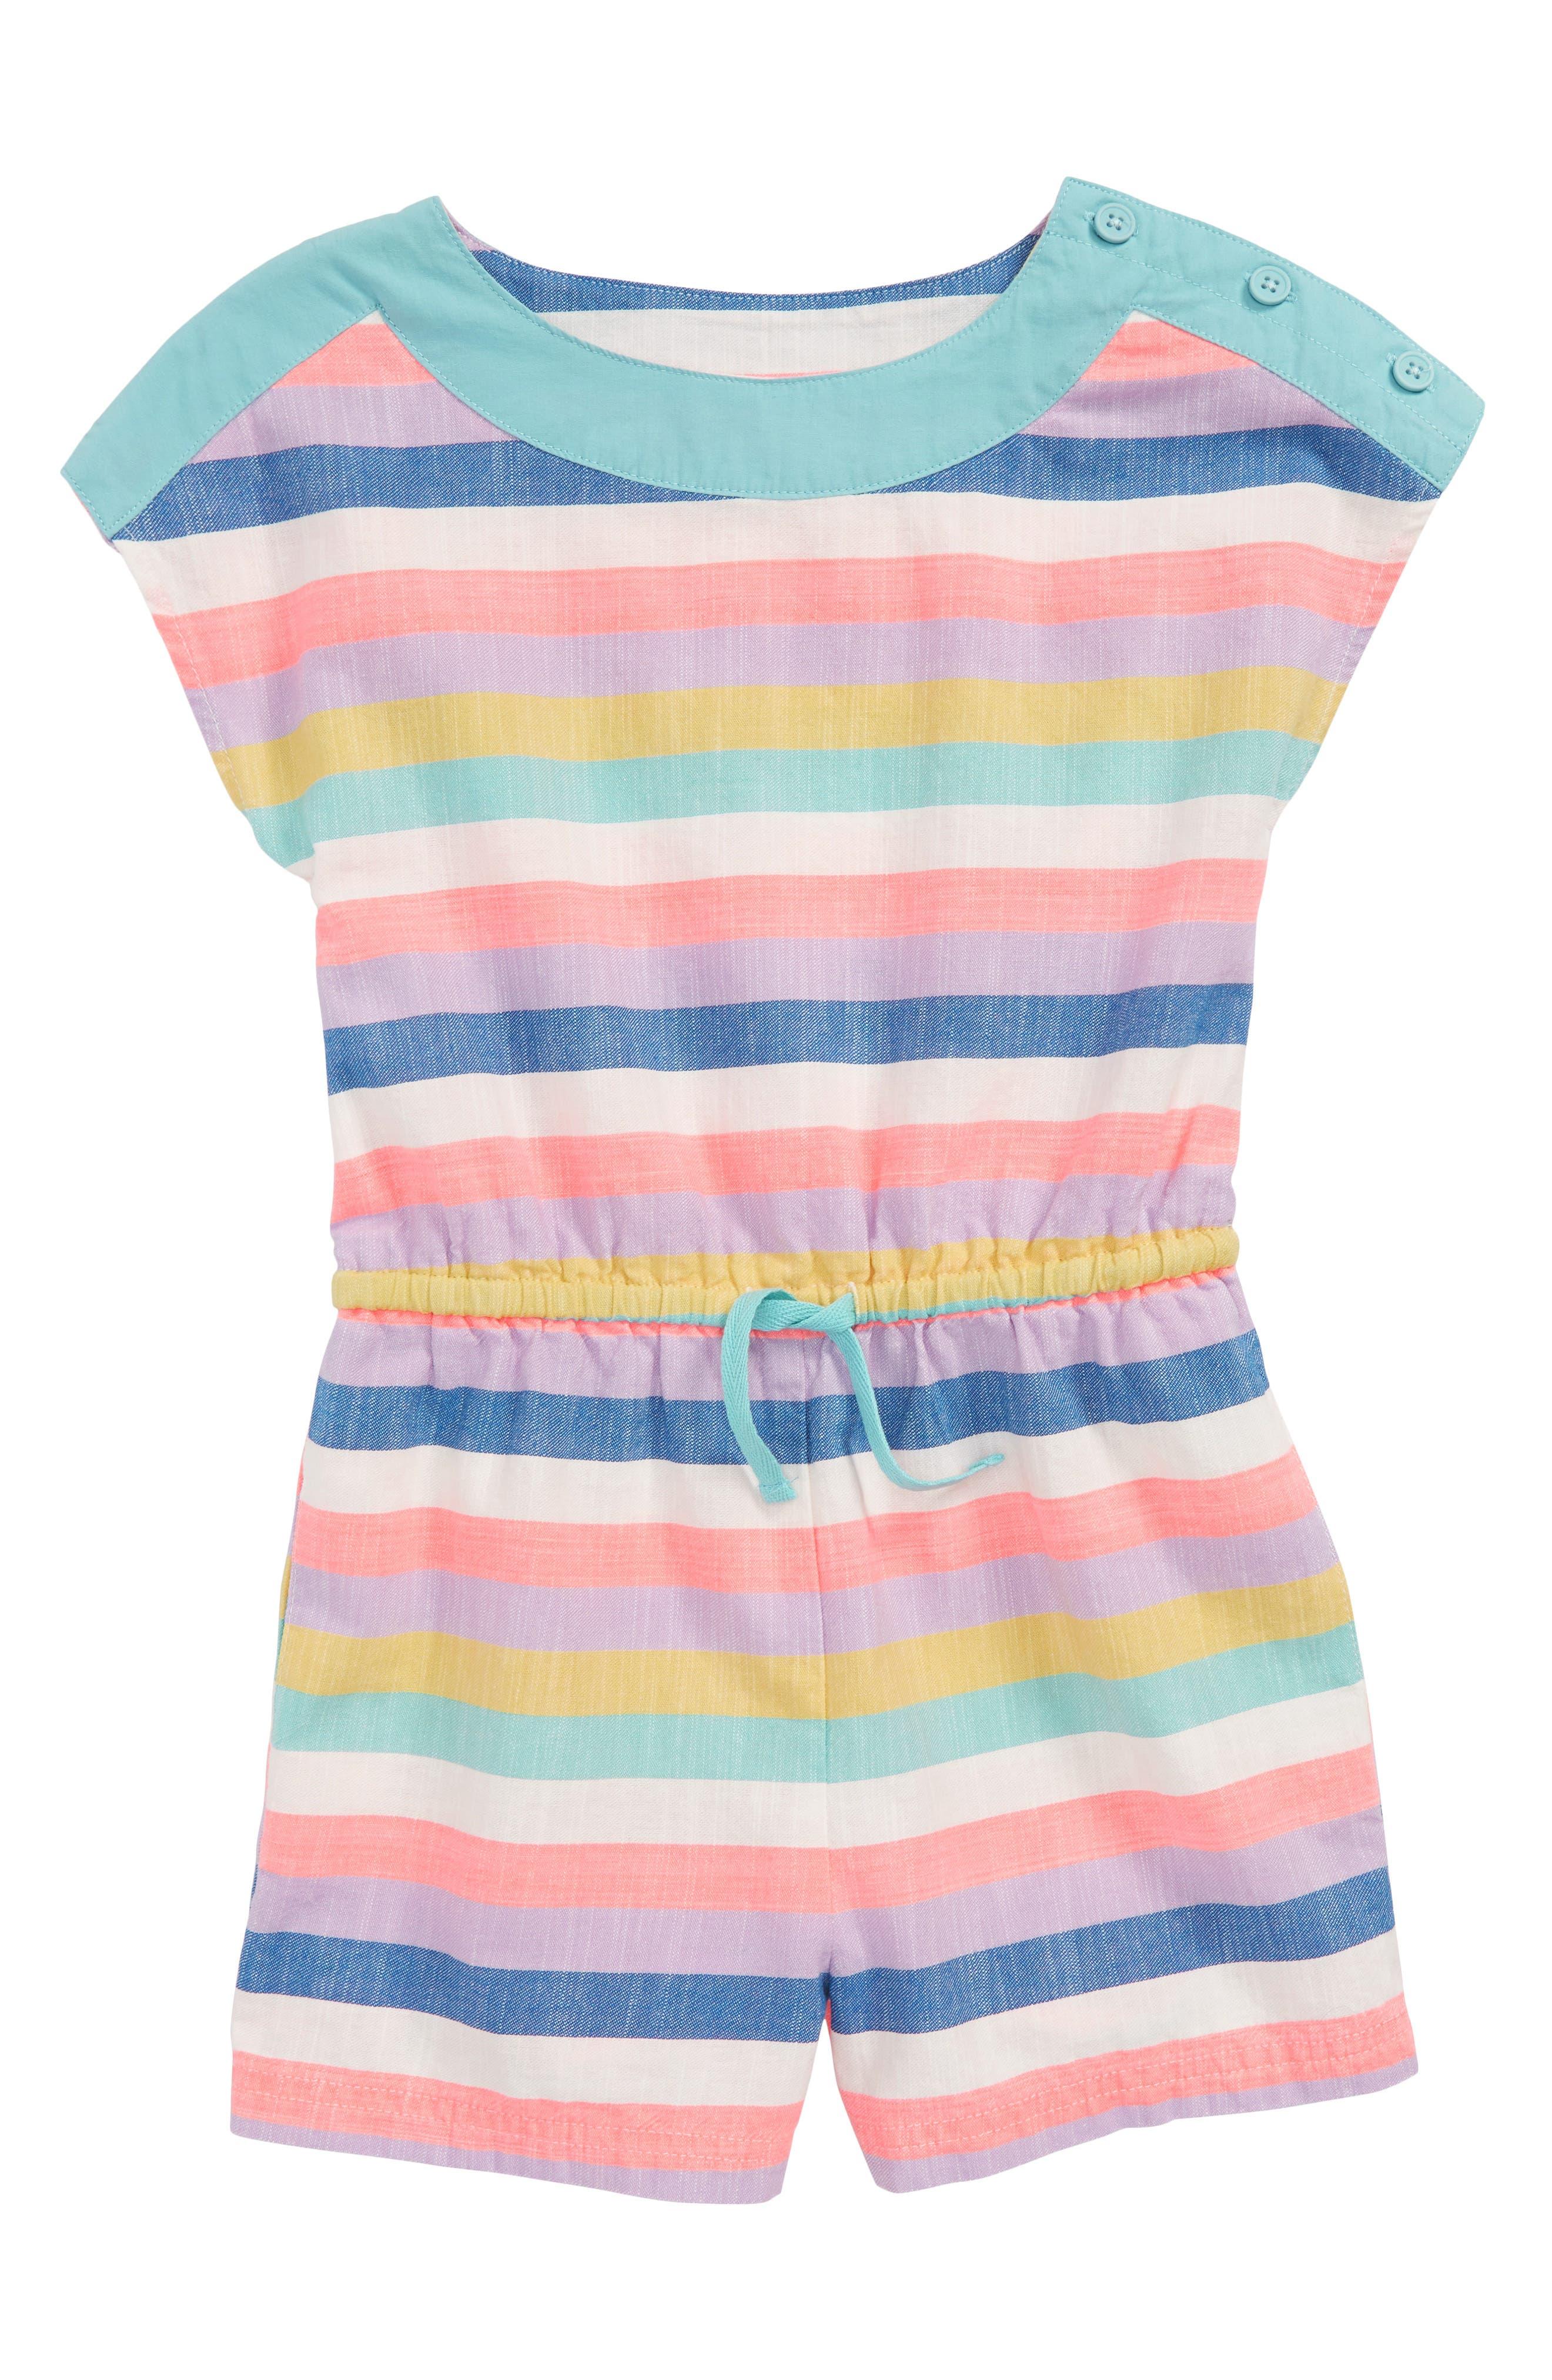 Stripe Romper,                         Main,                         color, Candy Stripe Pnk